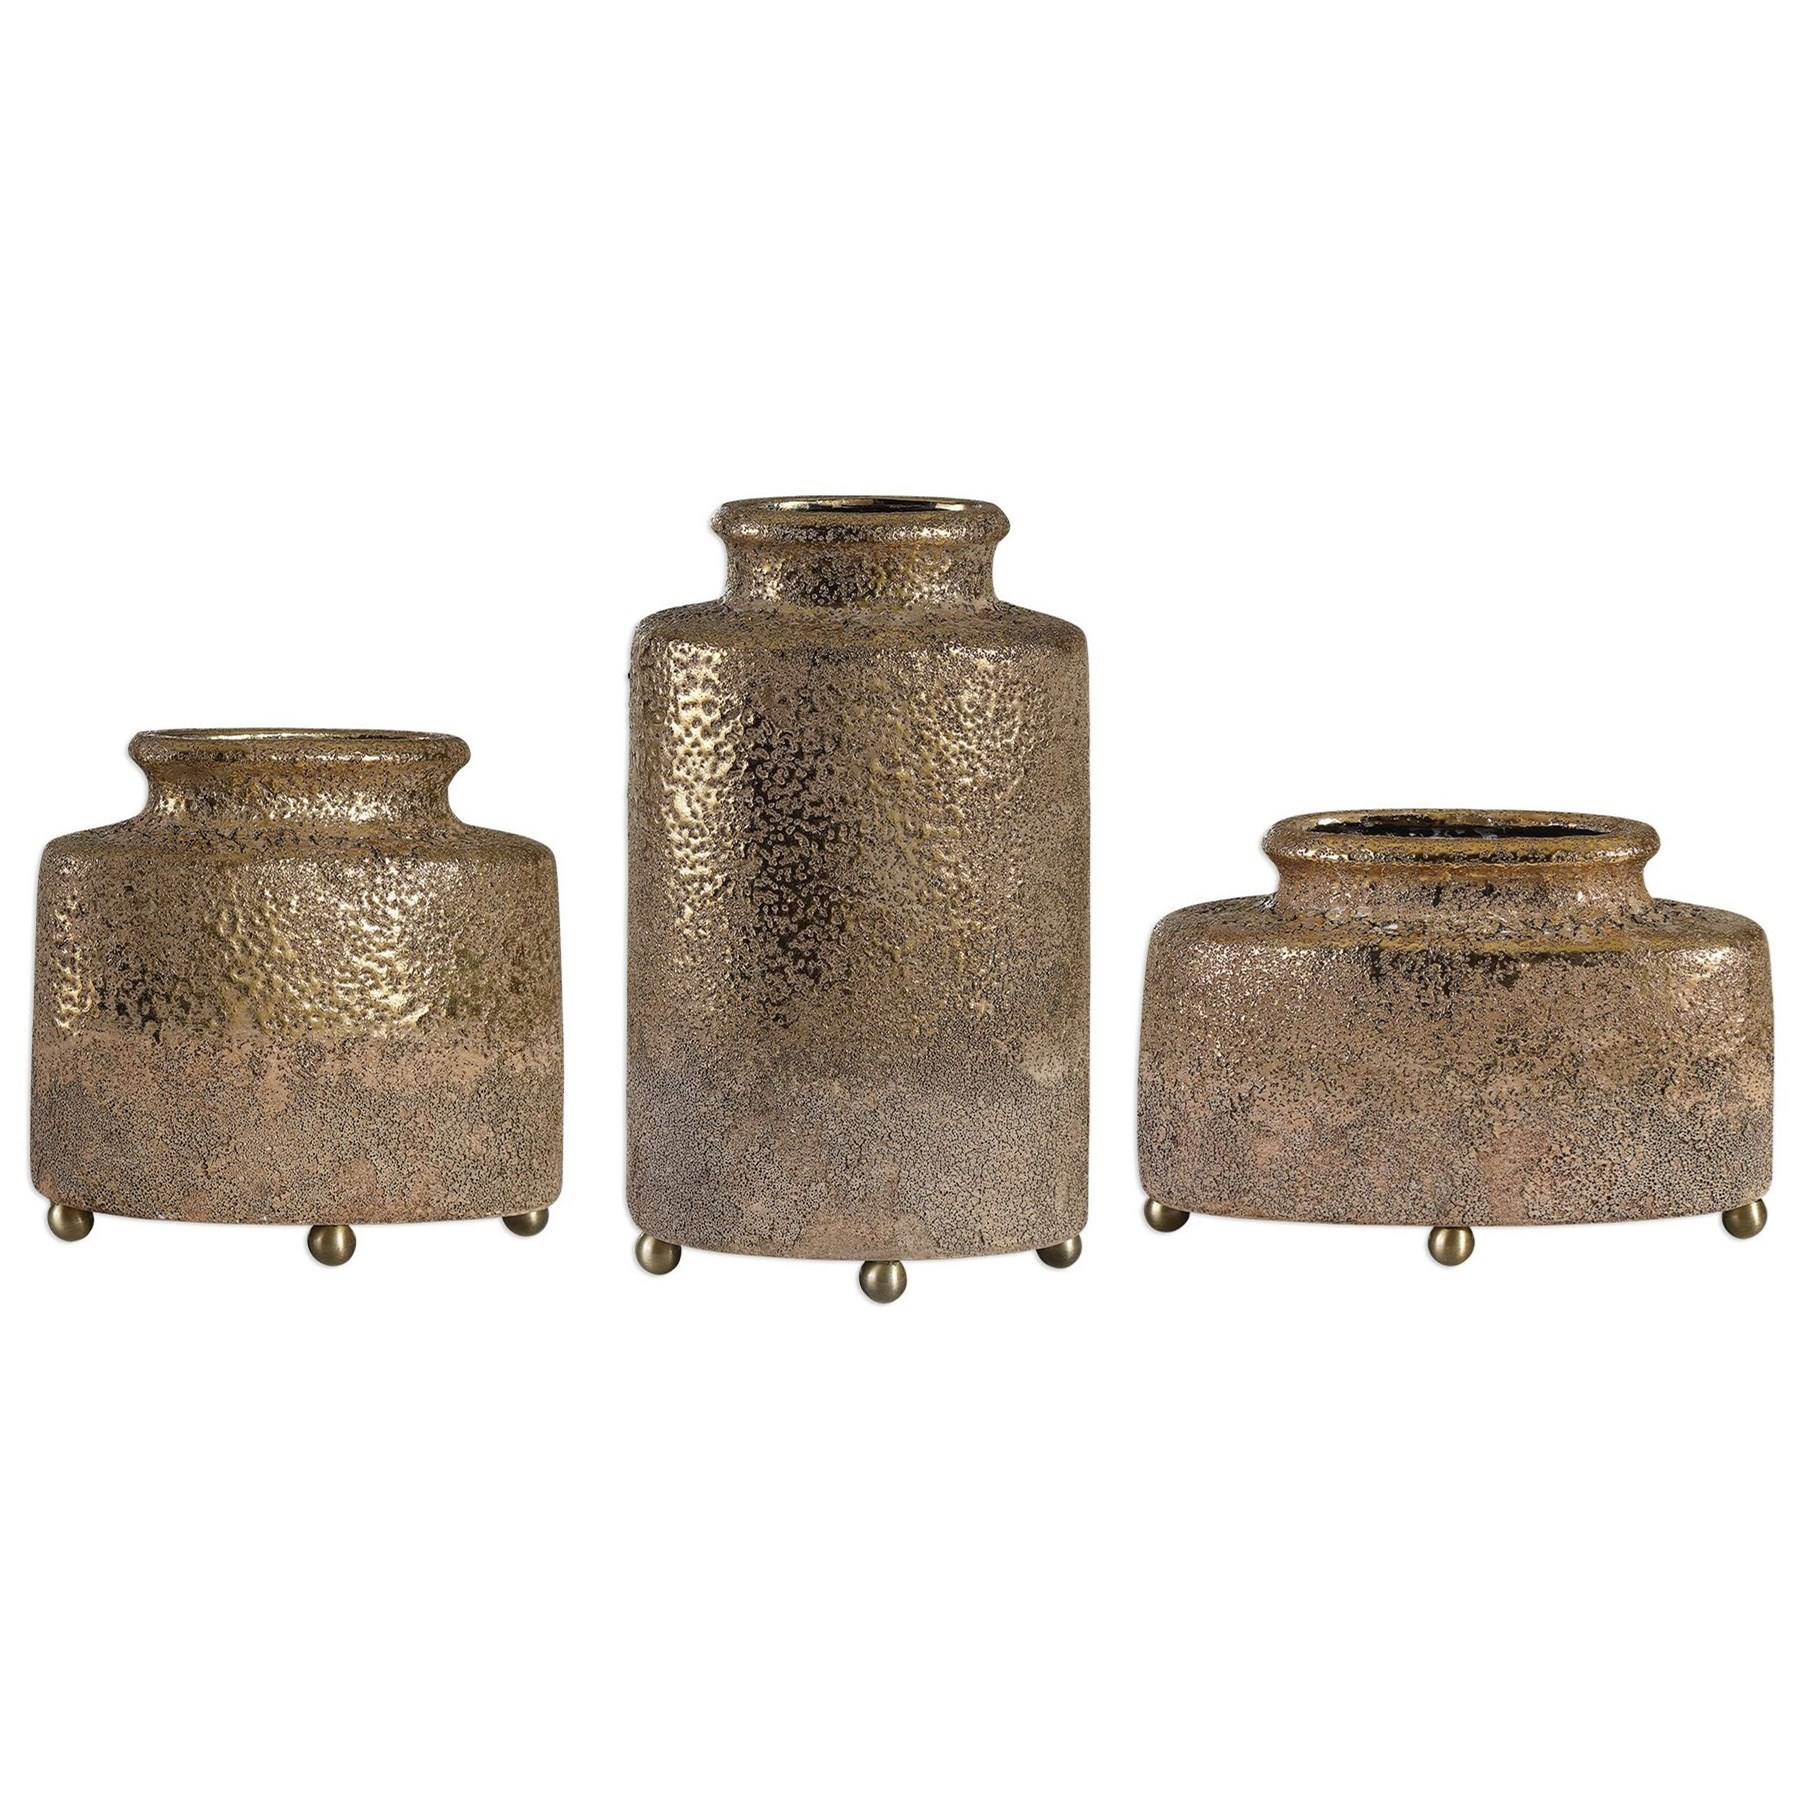 Accessories - Vases and Urns Kallie Metallic Golden Vessels S/3 by Uttermost at Mueller Furniture